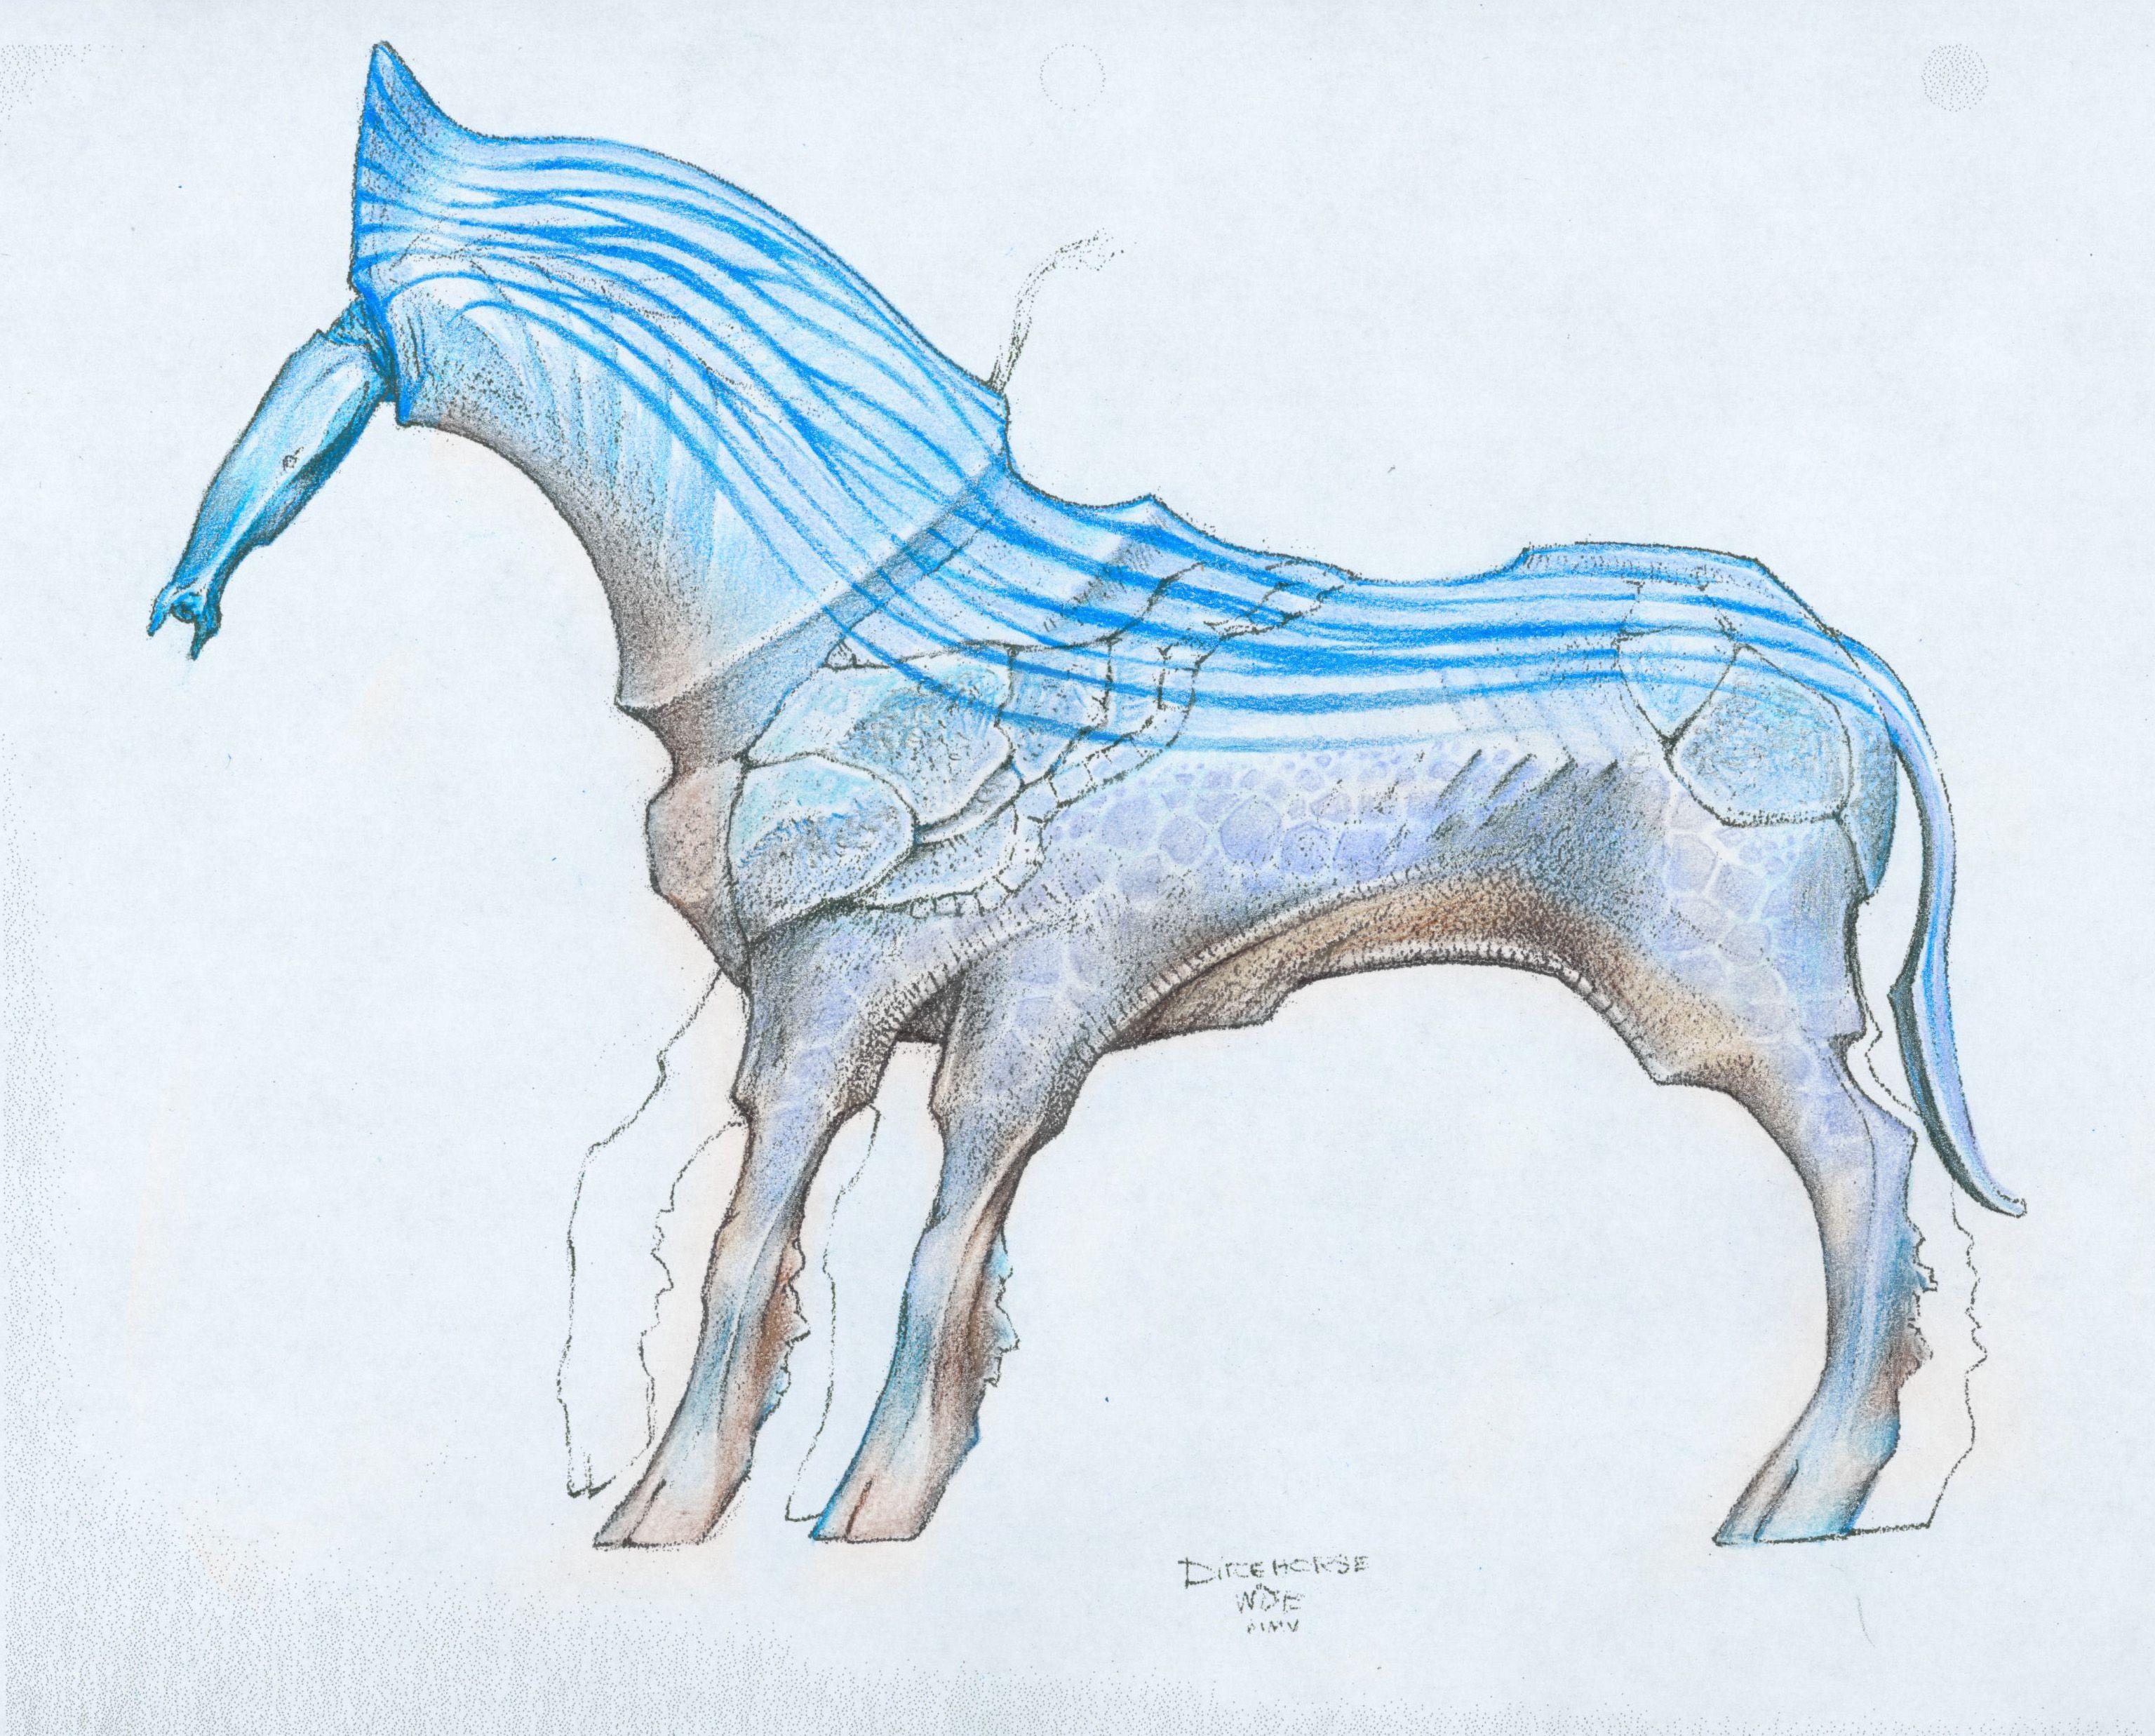 Wayne Barlowe Concept study for Avatar ARTIST WAYNE